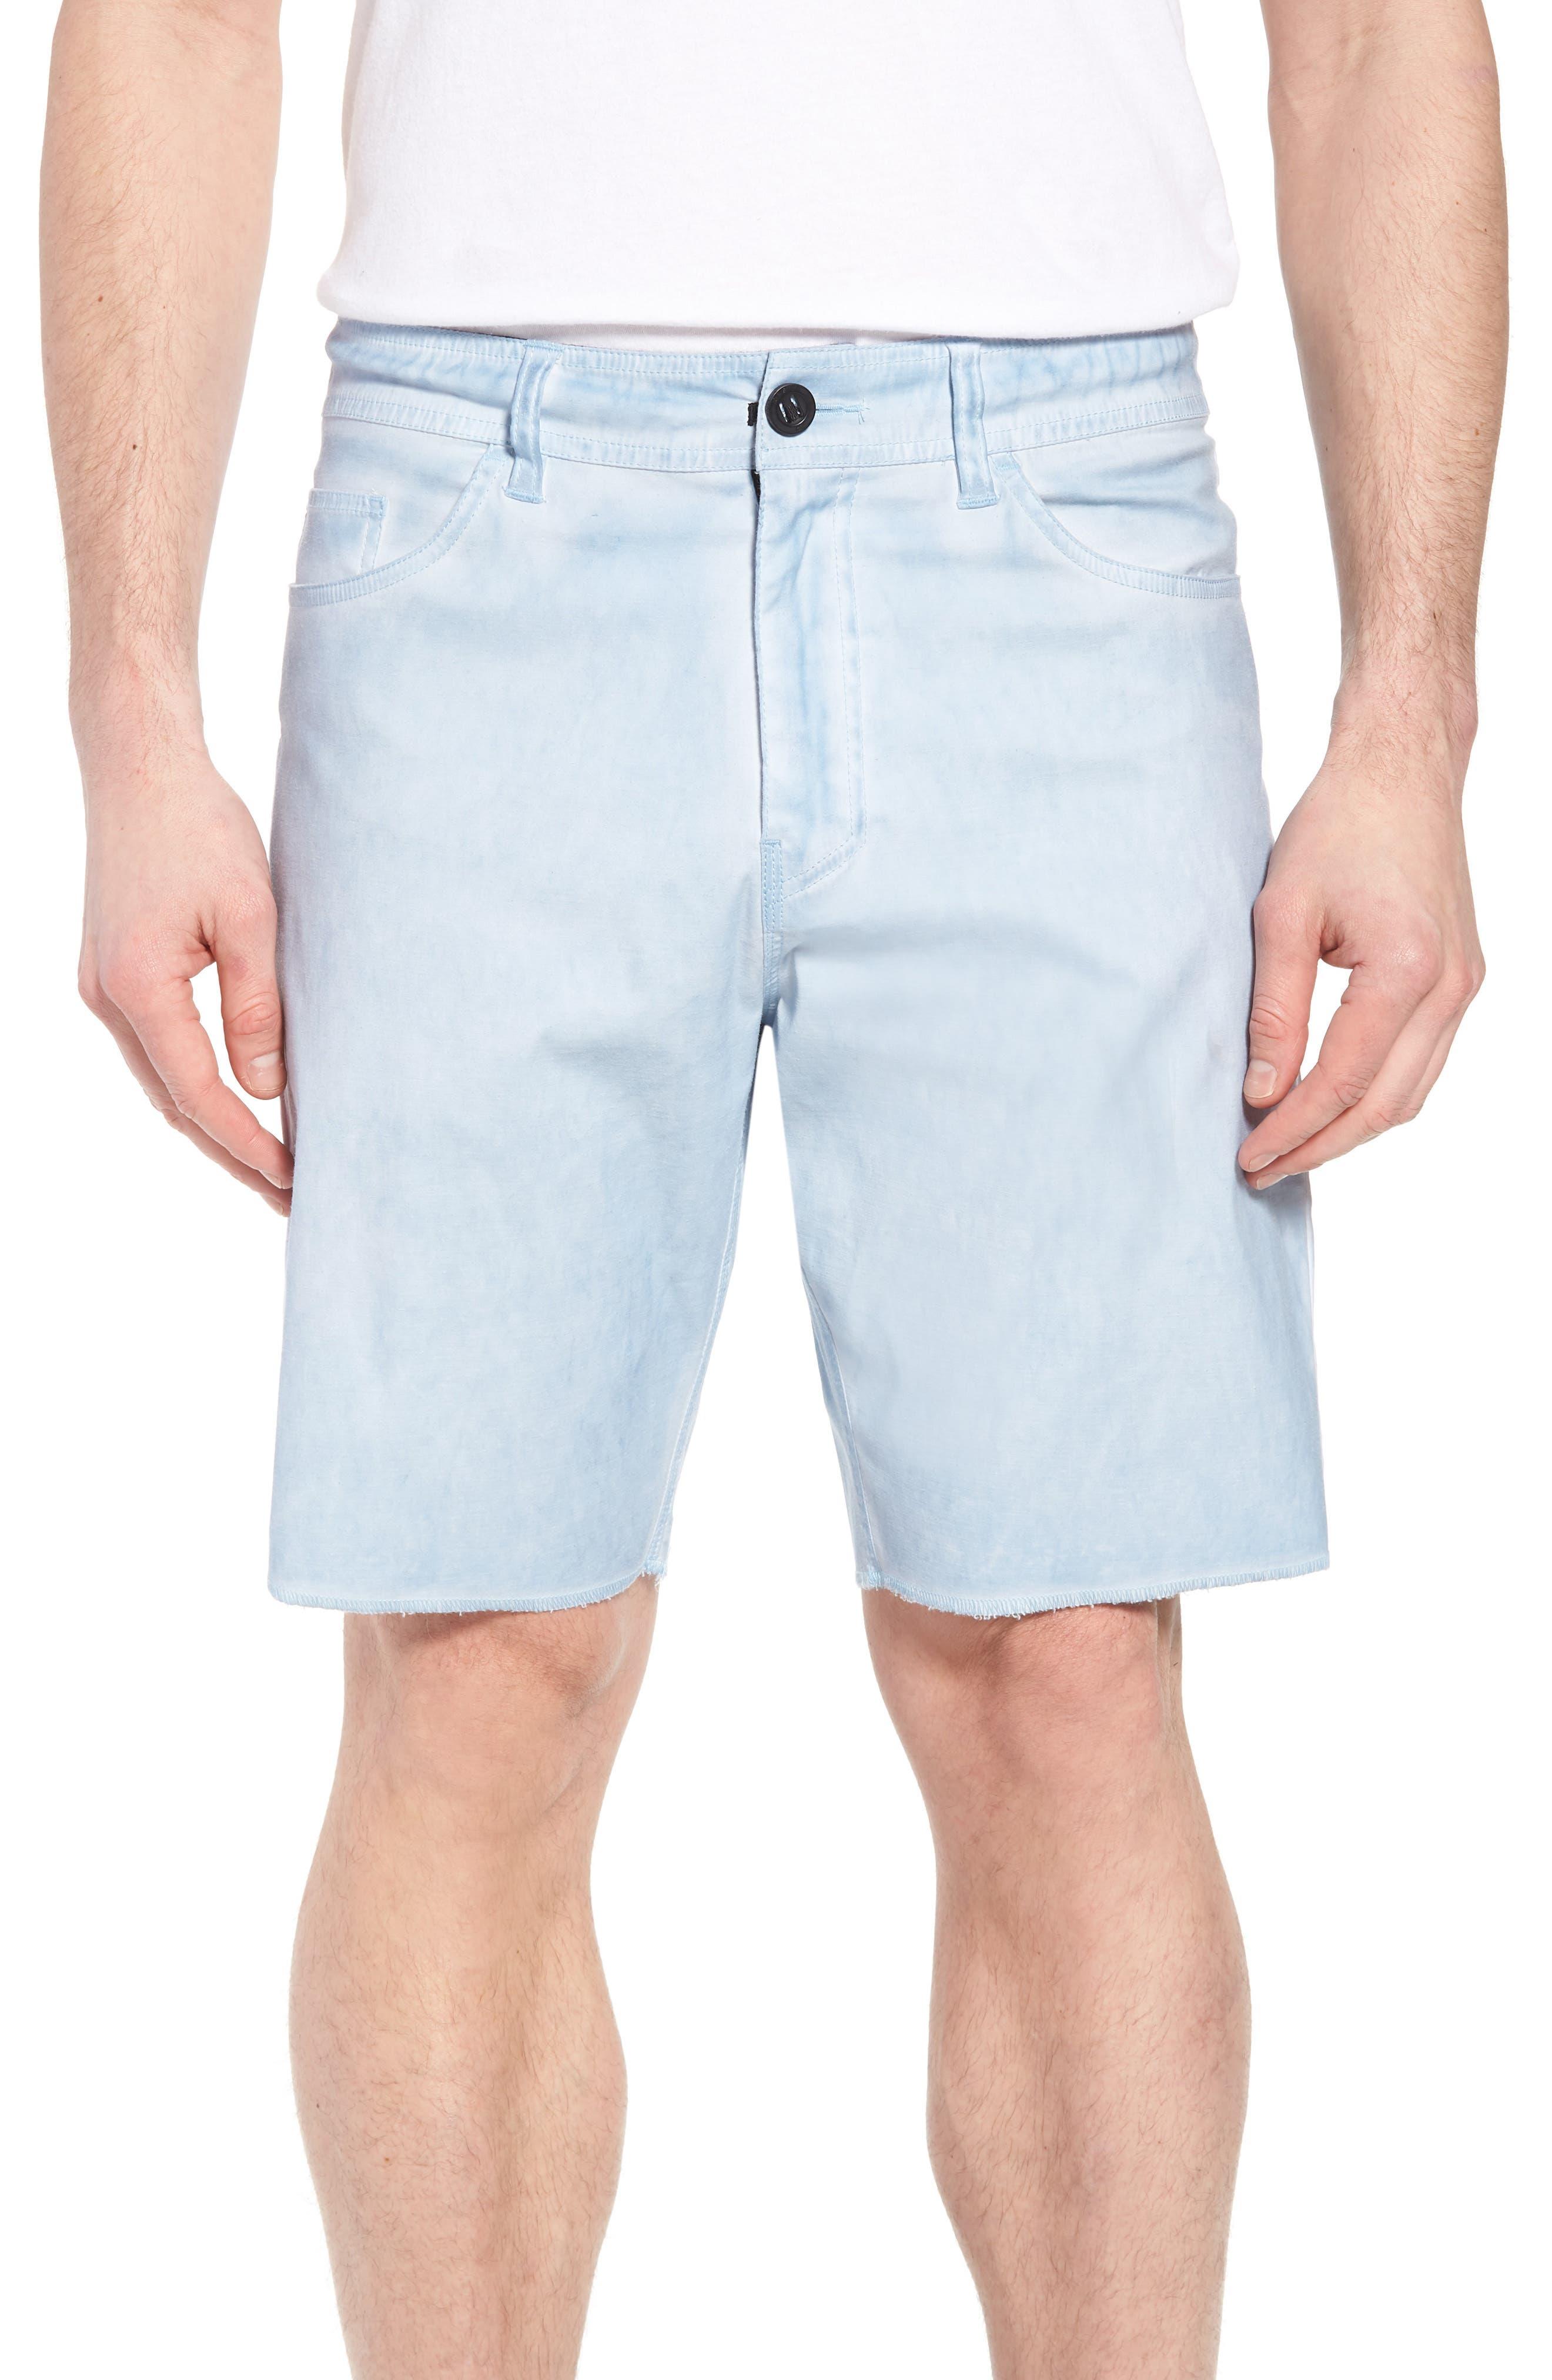 Kick Back Hybrid Shorts,                             Main thumbnail 1, color,                             Light Indigo